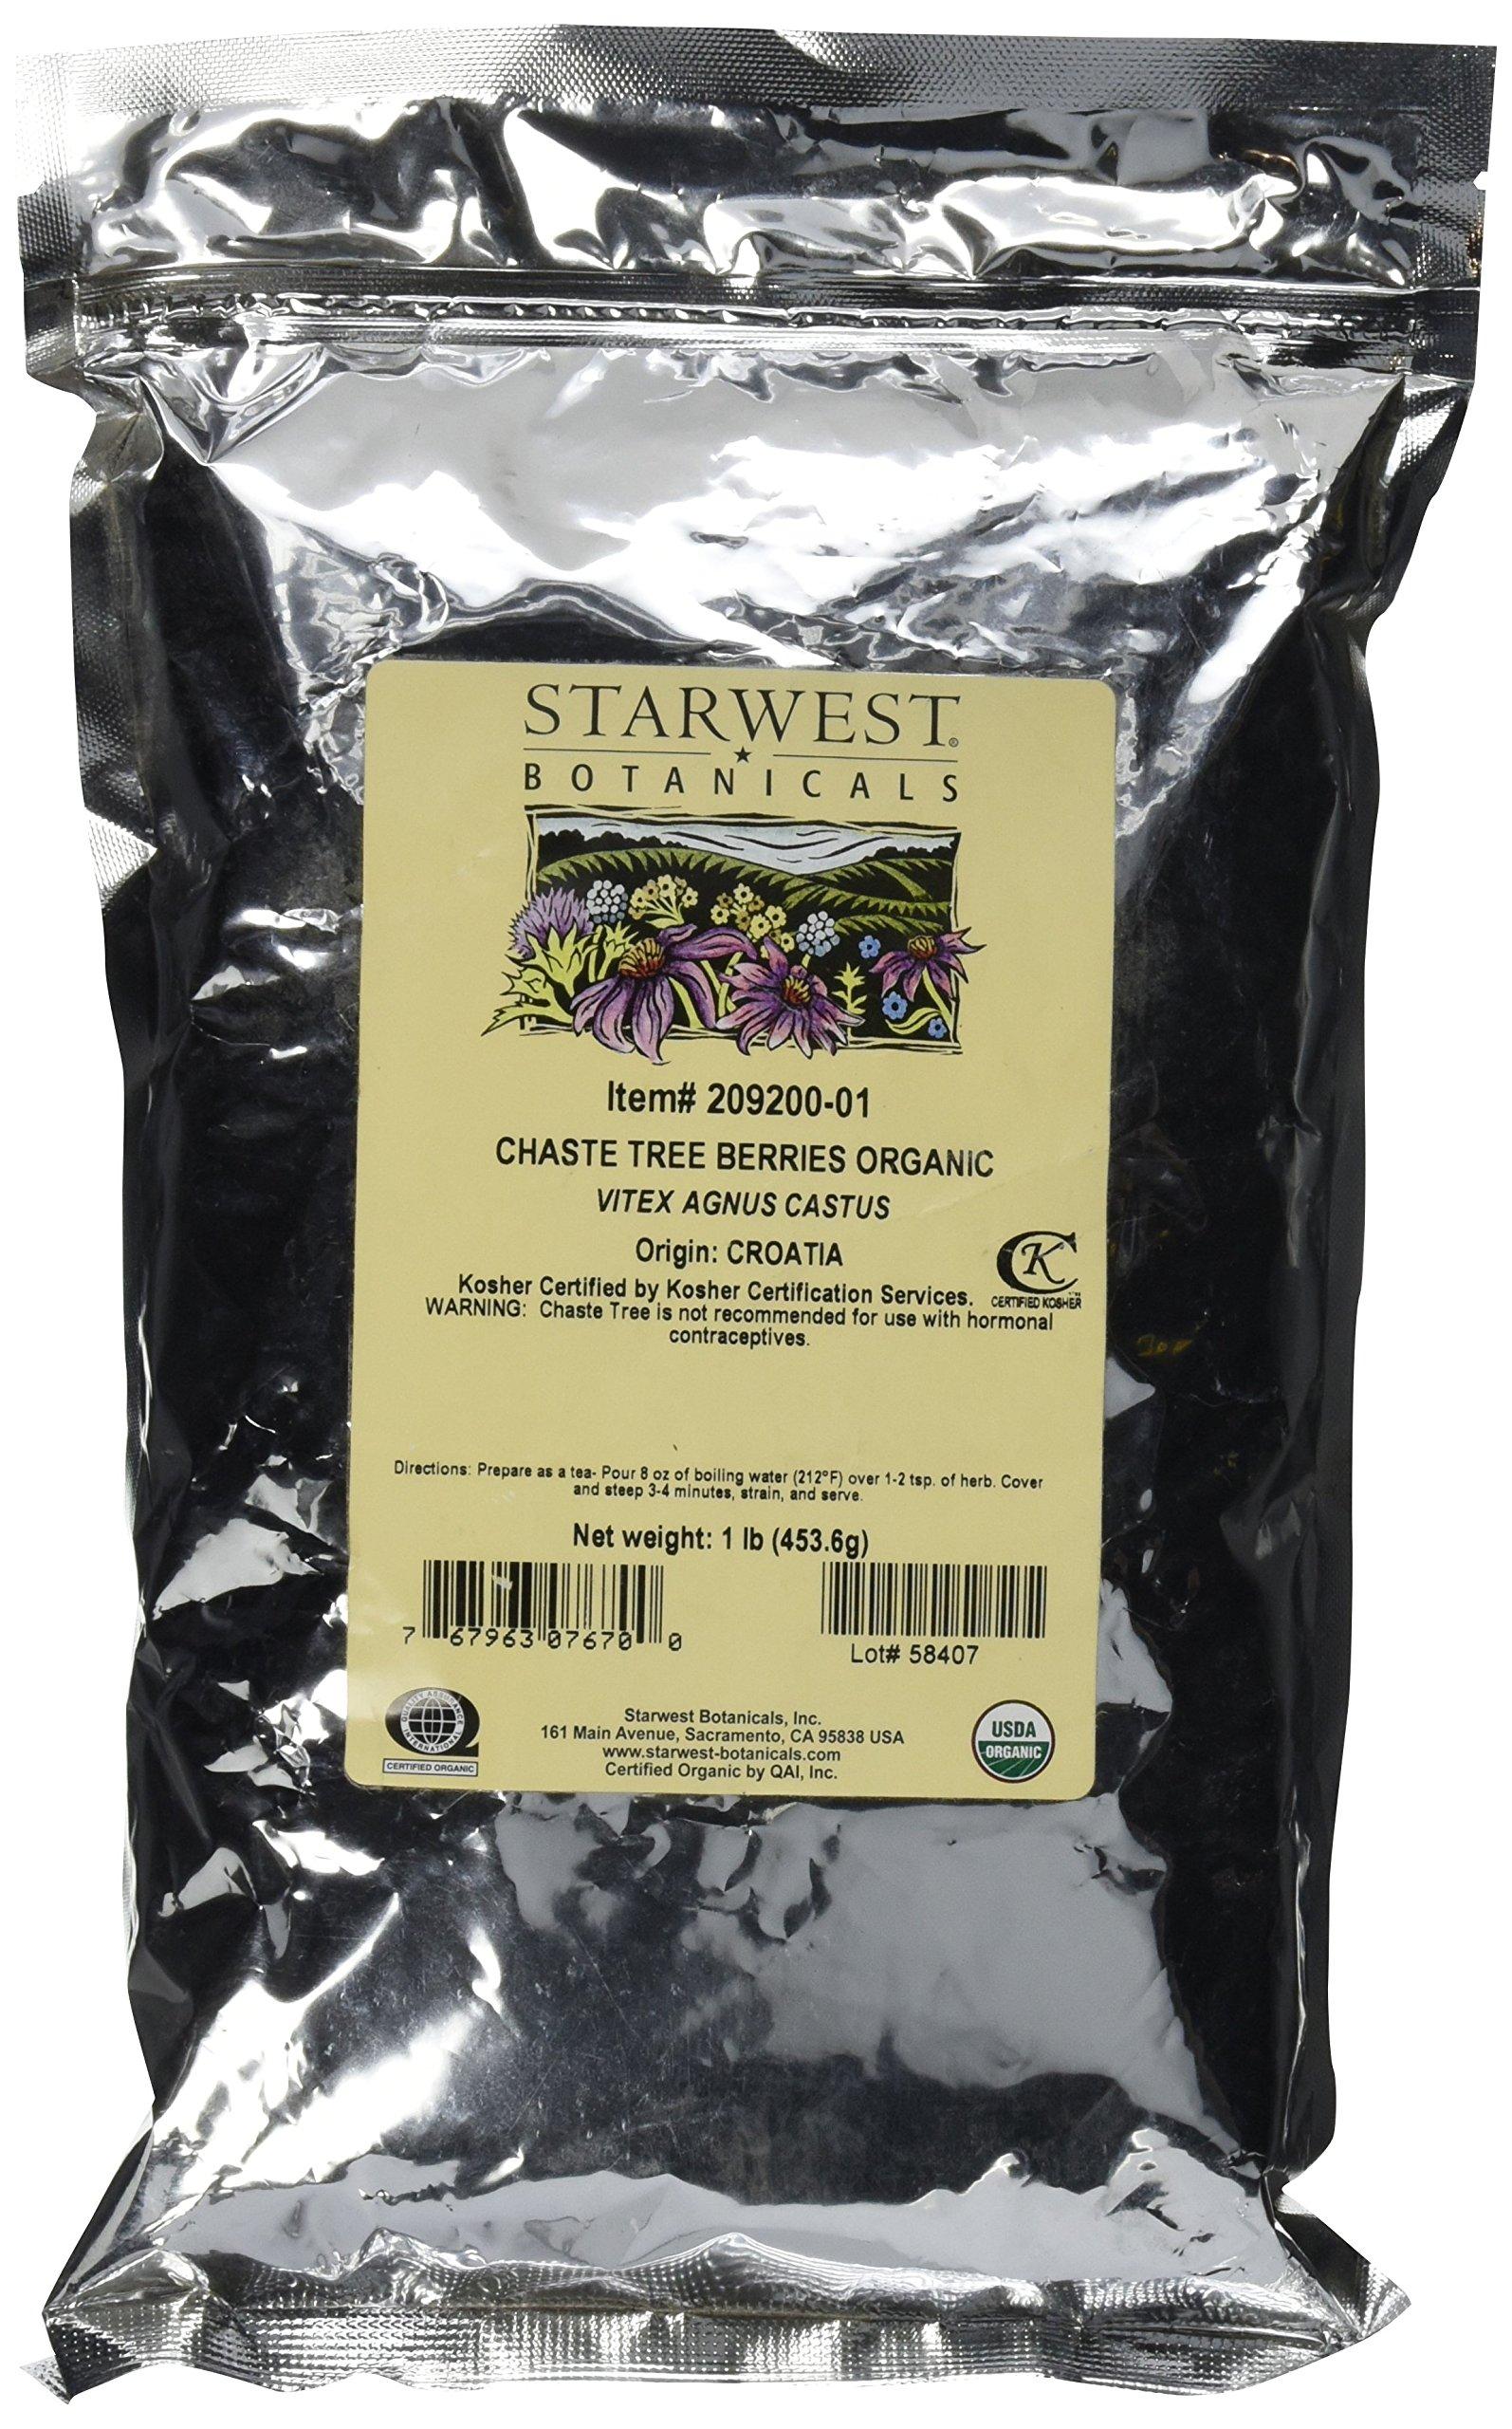 Starwest Botanicals Organic Chaste Tree Berries Whole, 1 Lb